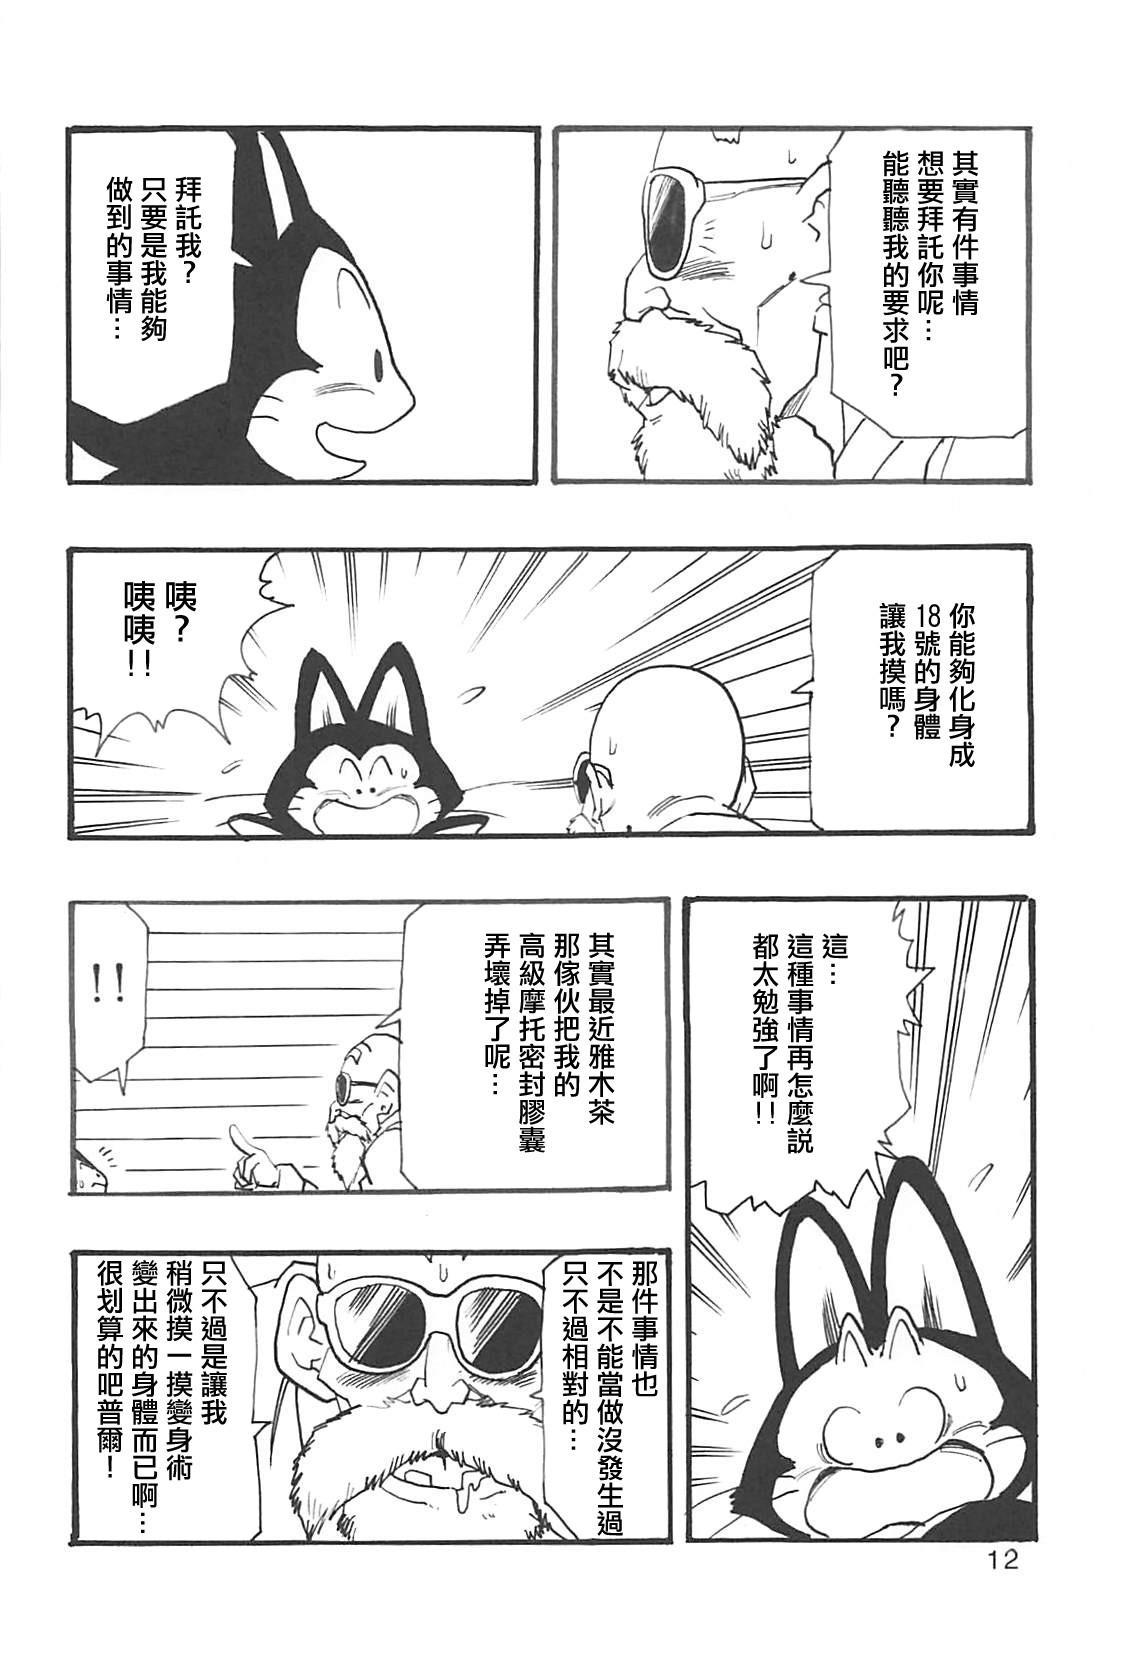 Dragon Ball Girls Collection 1 Fukkokuban 12